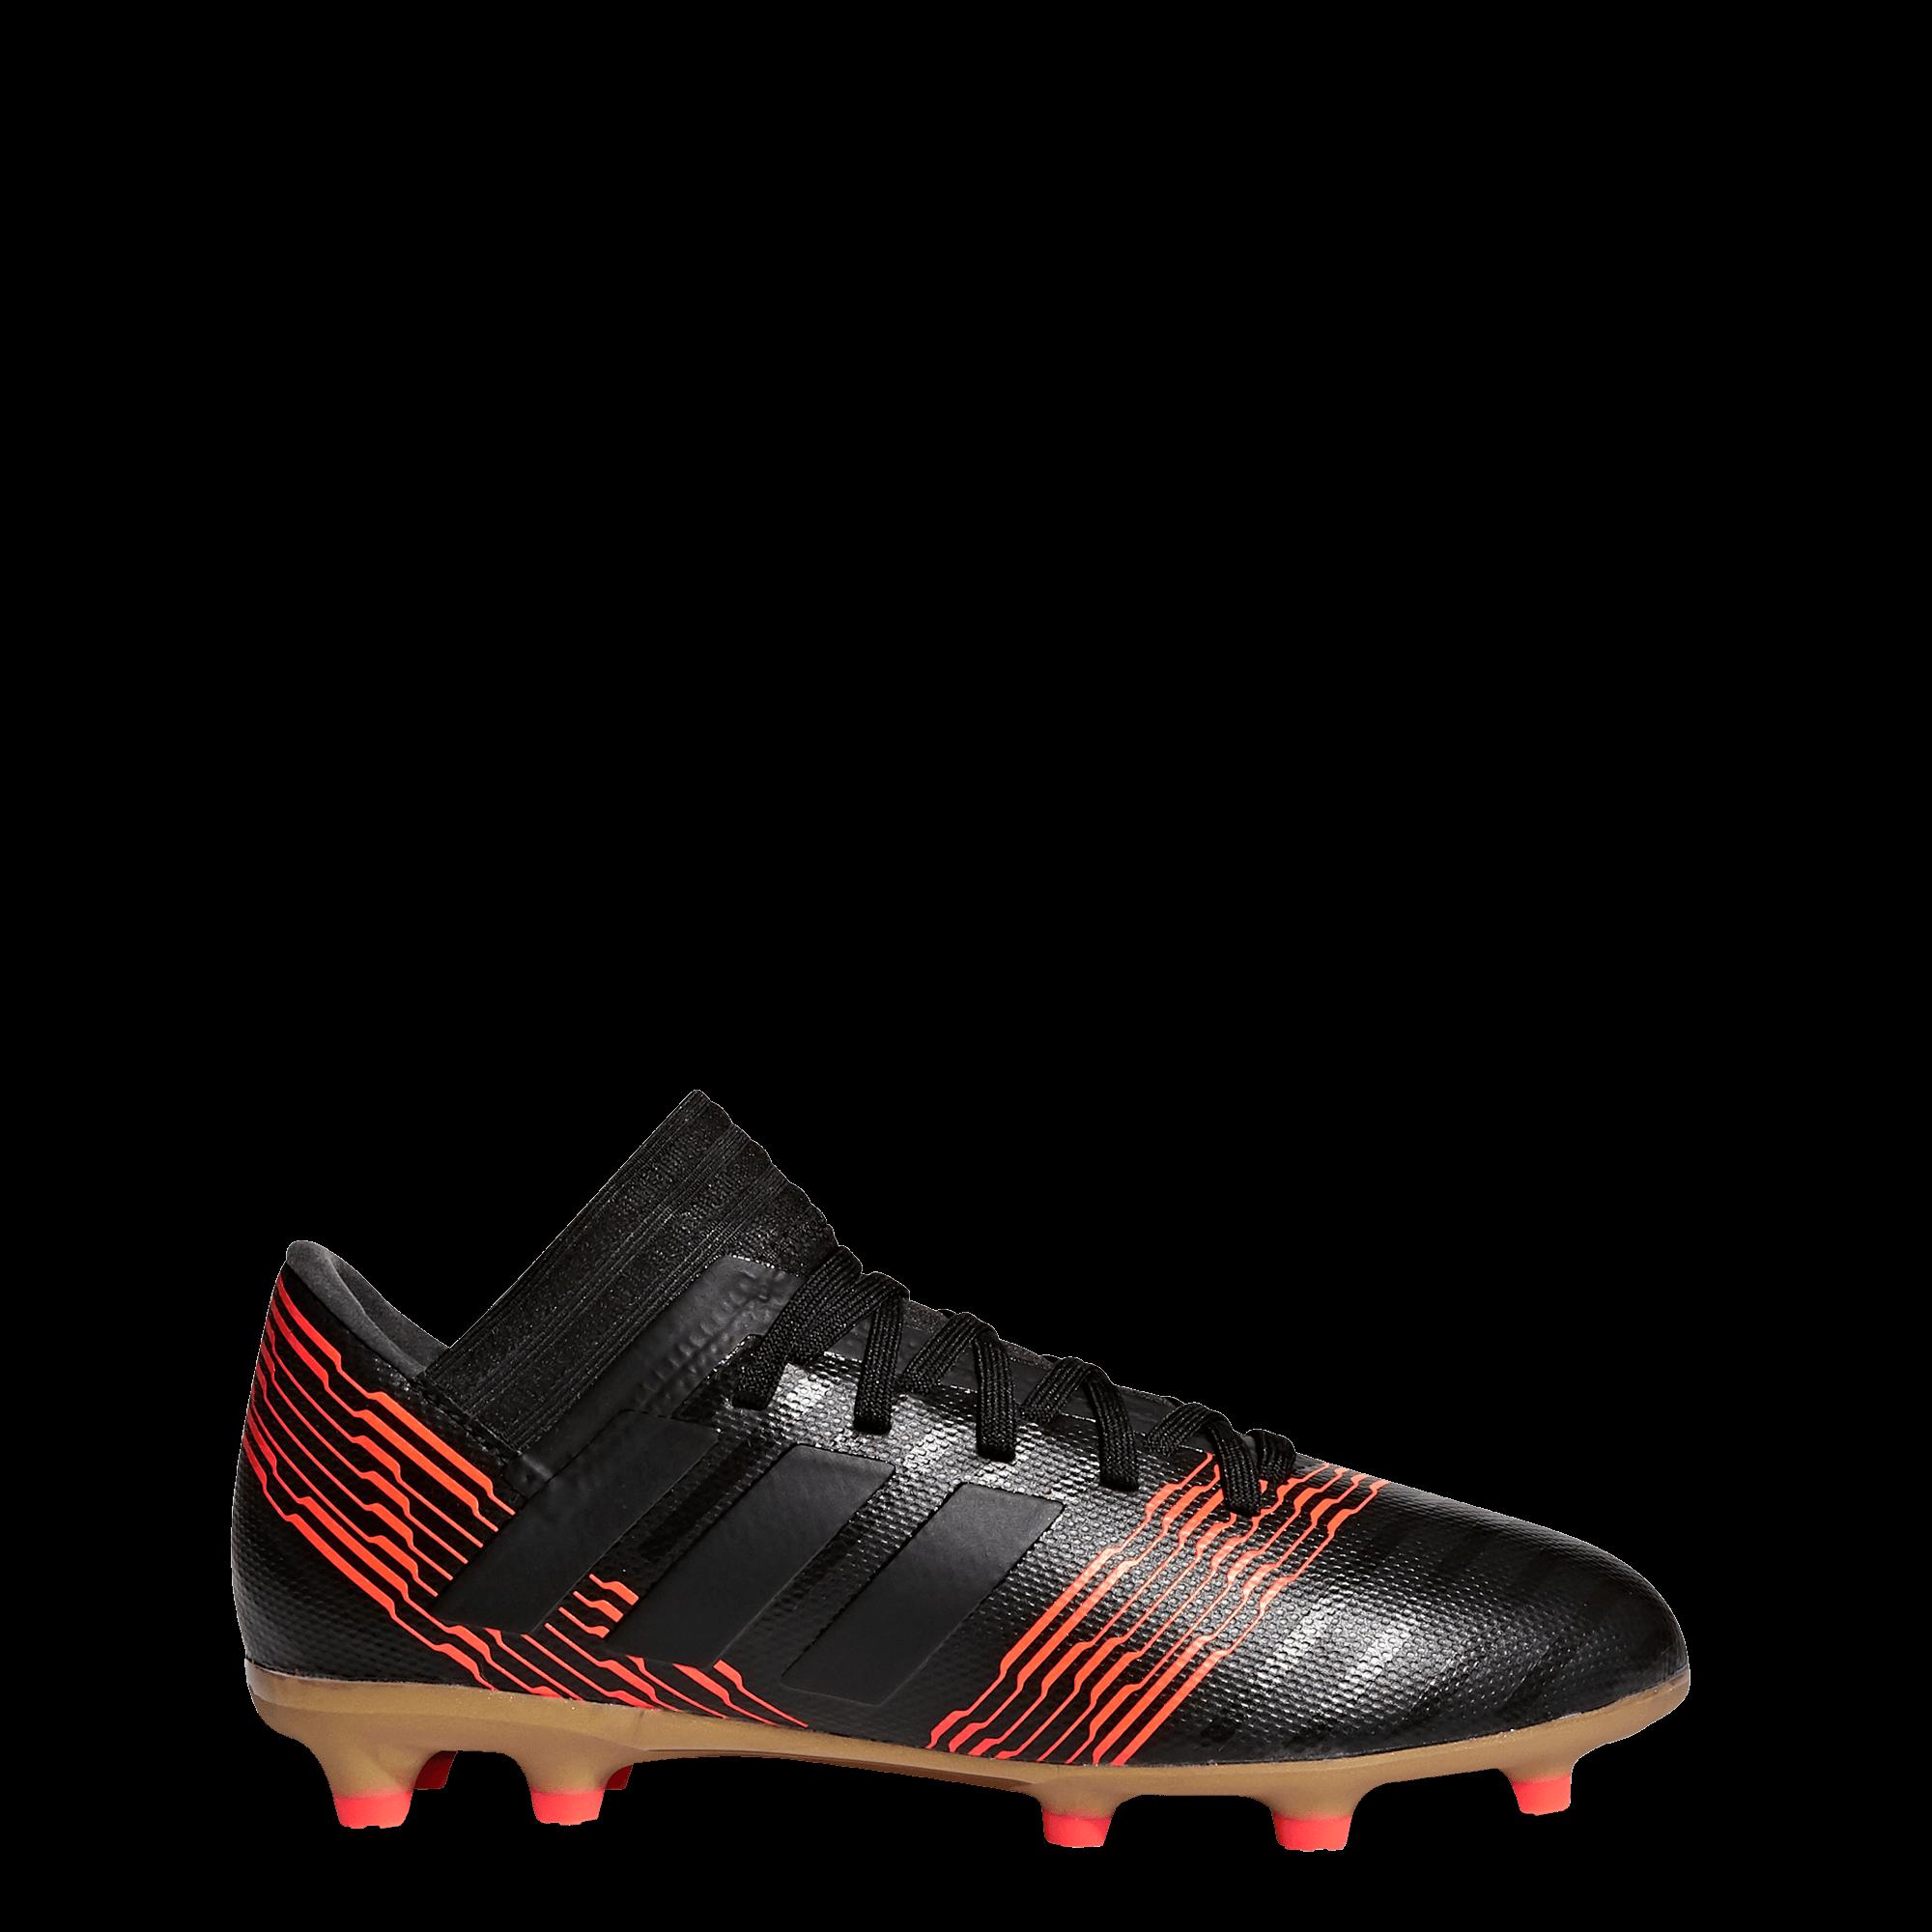 newest collection 50efe f02a1 adidas Nemeziz 17.3 Firm Ground Voetbalschoen Kids zijkant